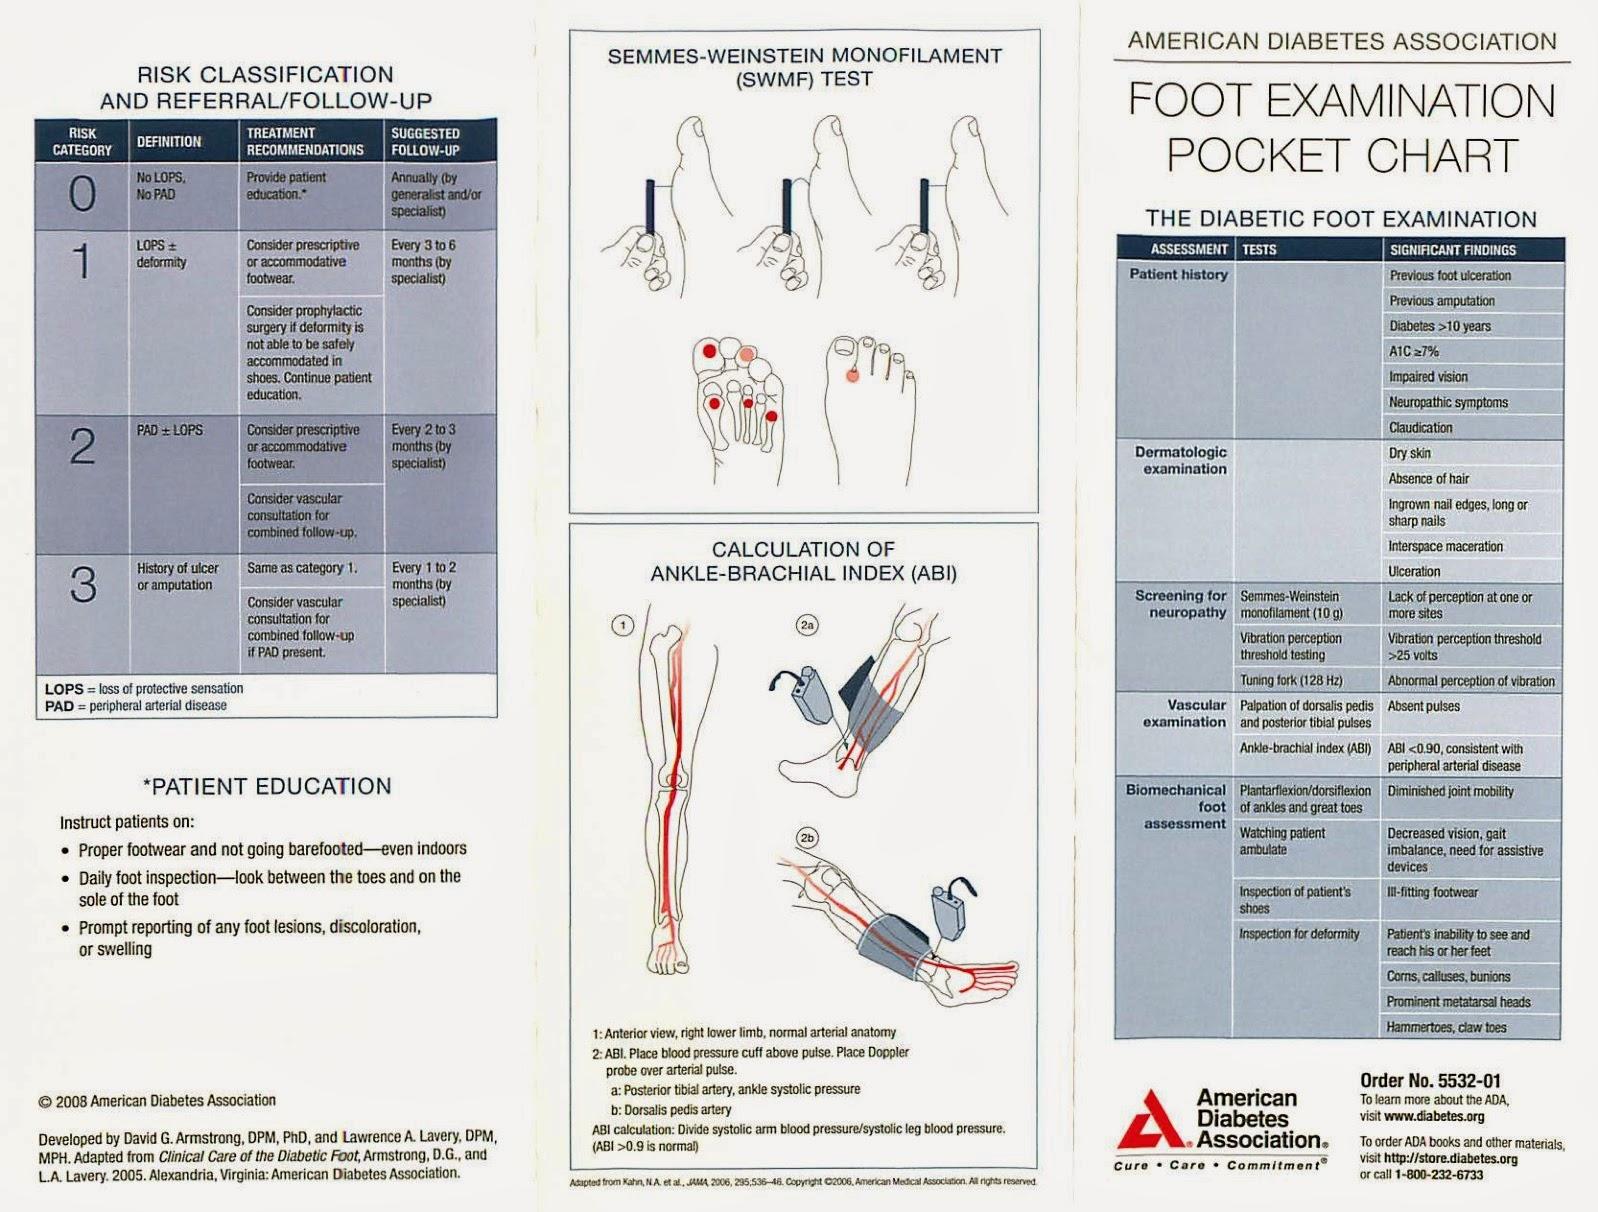 Foot Exam Pocket Chart | DF Blog